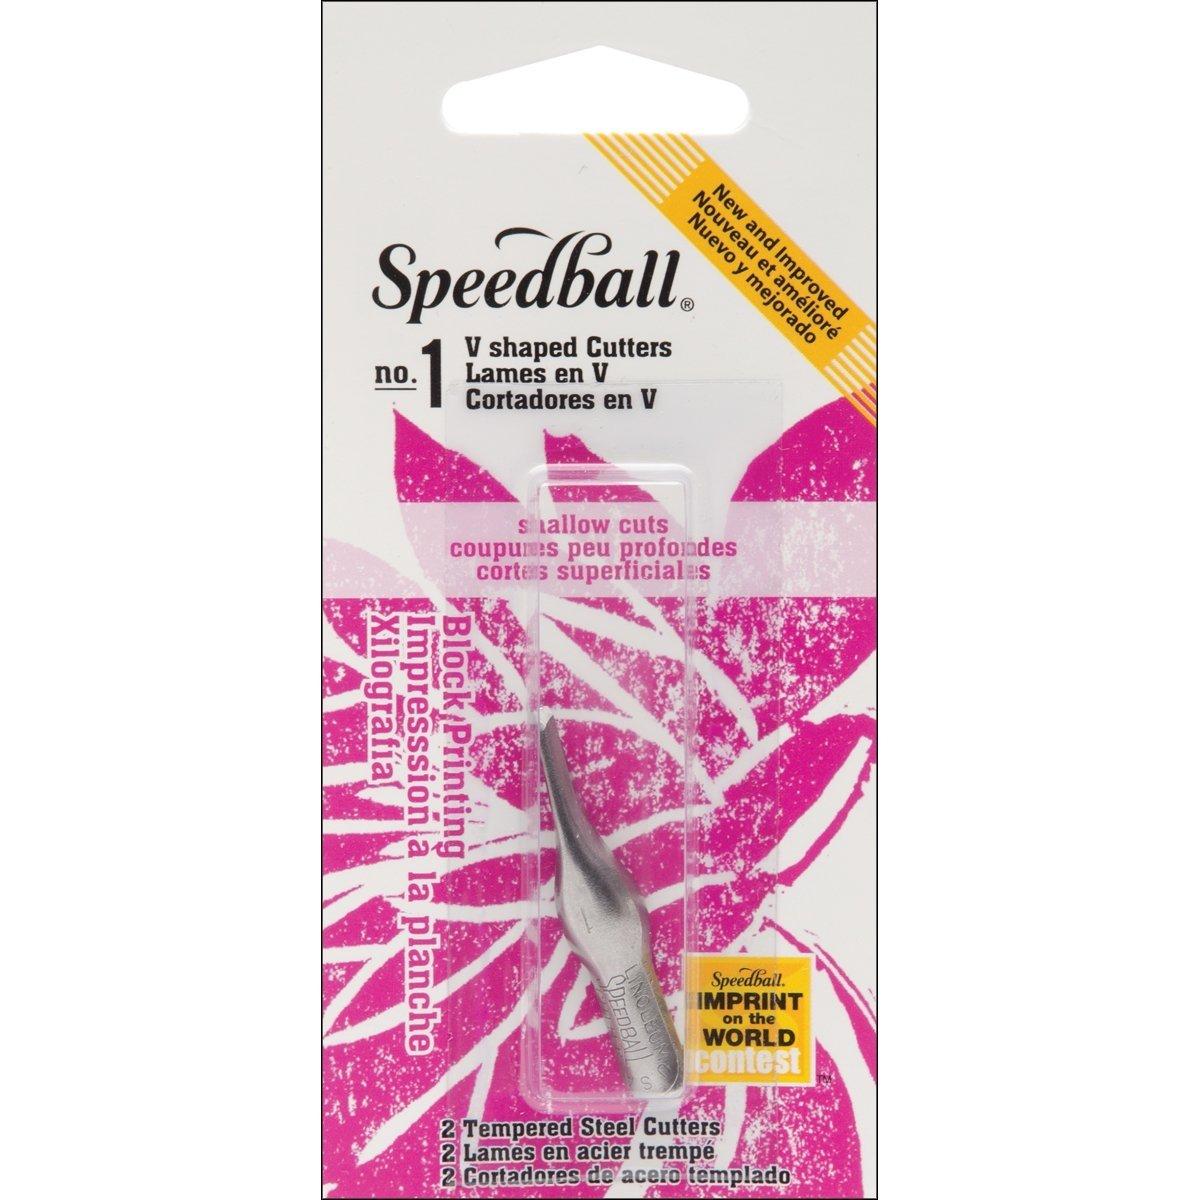 Speedball Lino Cutter Blades 2/Pkg-No. 1 Small V